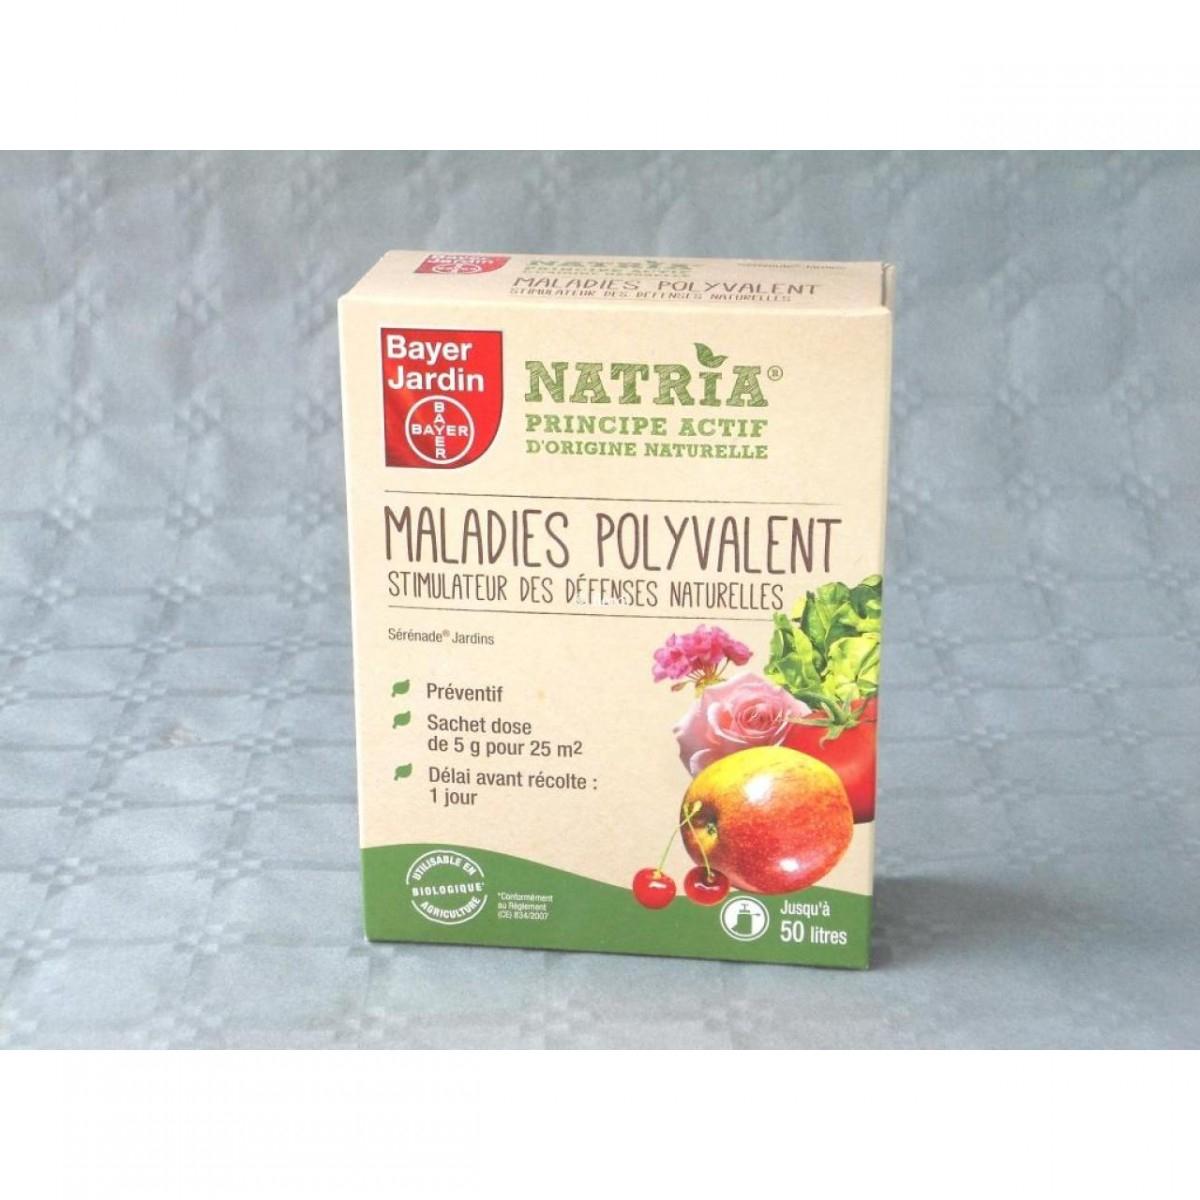 Soin Bio Potager Et Fruitier Megagreen, 125 G Solabiol ... tout Bayer Jardin Desherbant Gazon